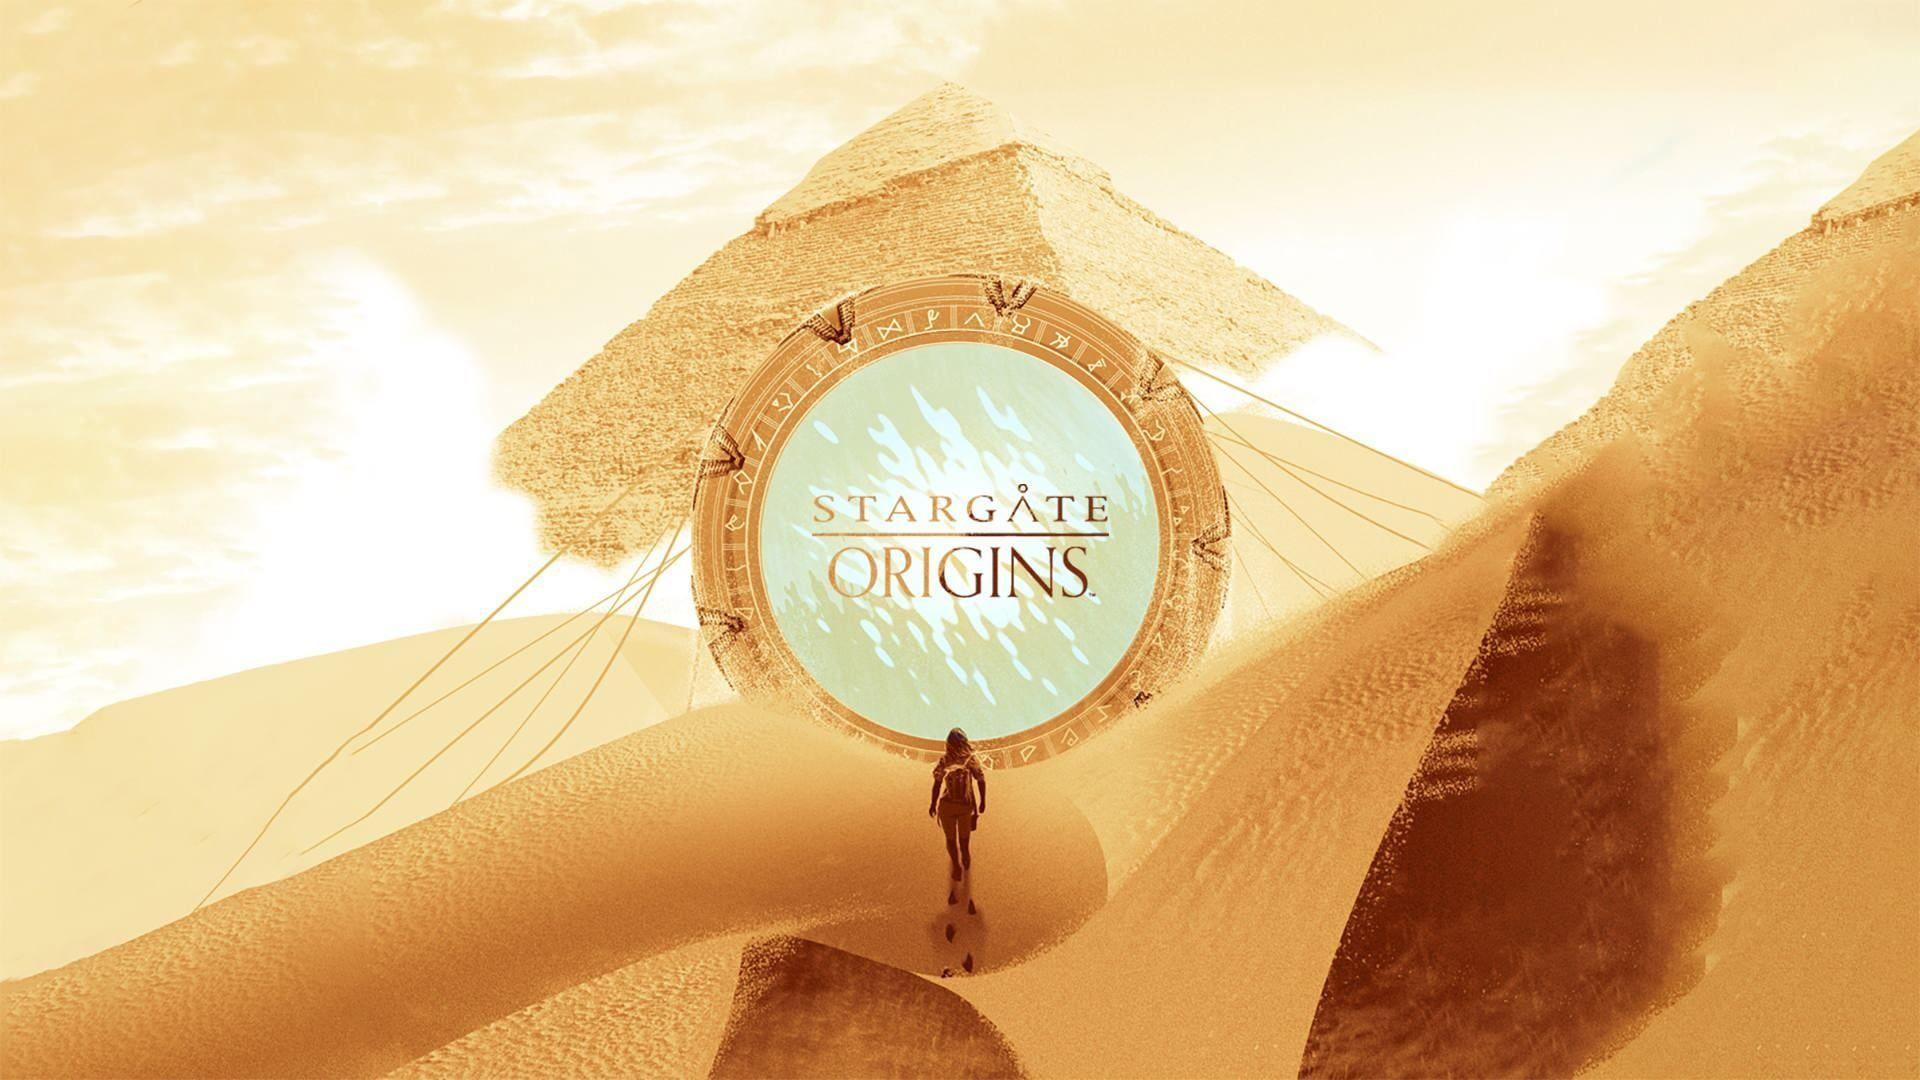 Show Stargate Origins